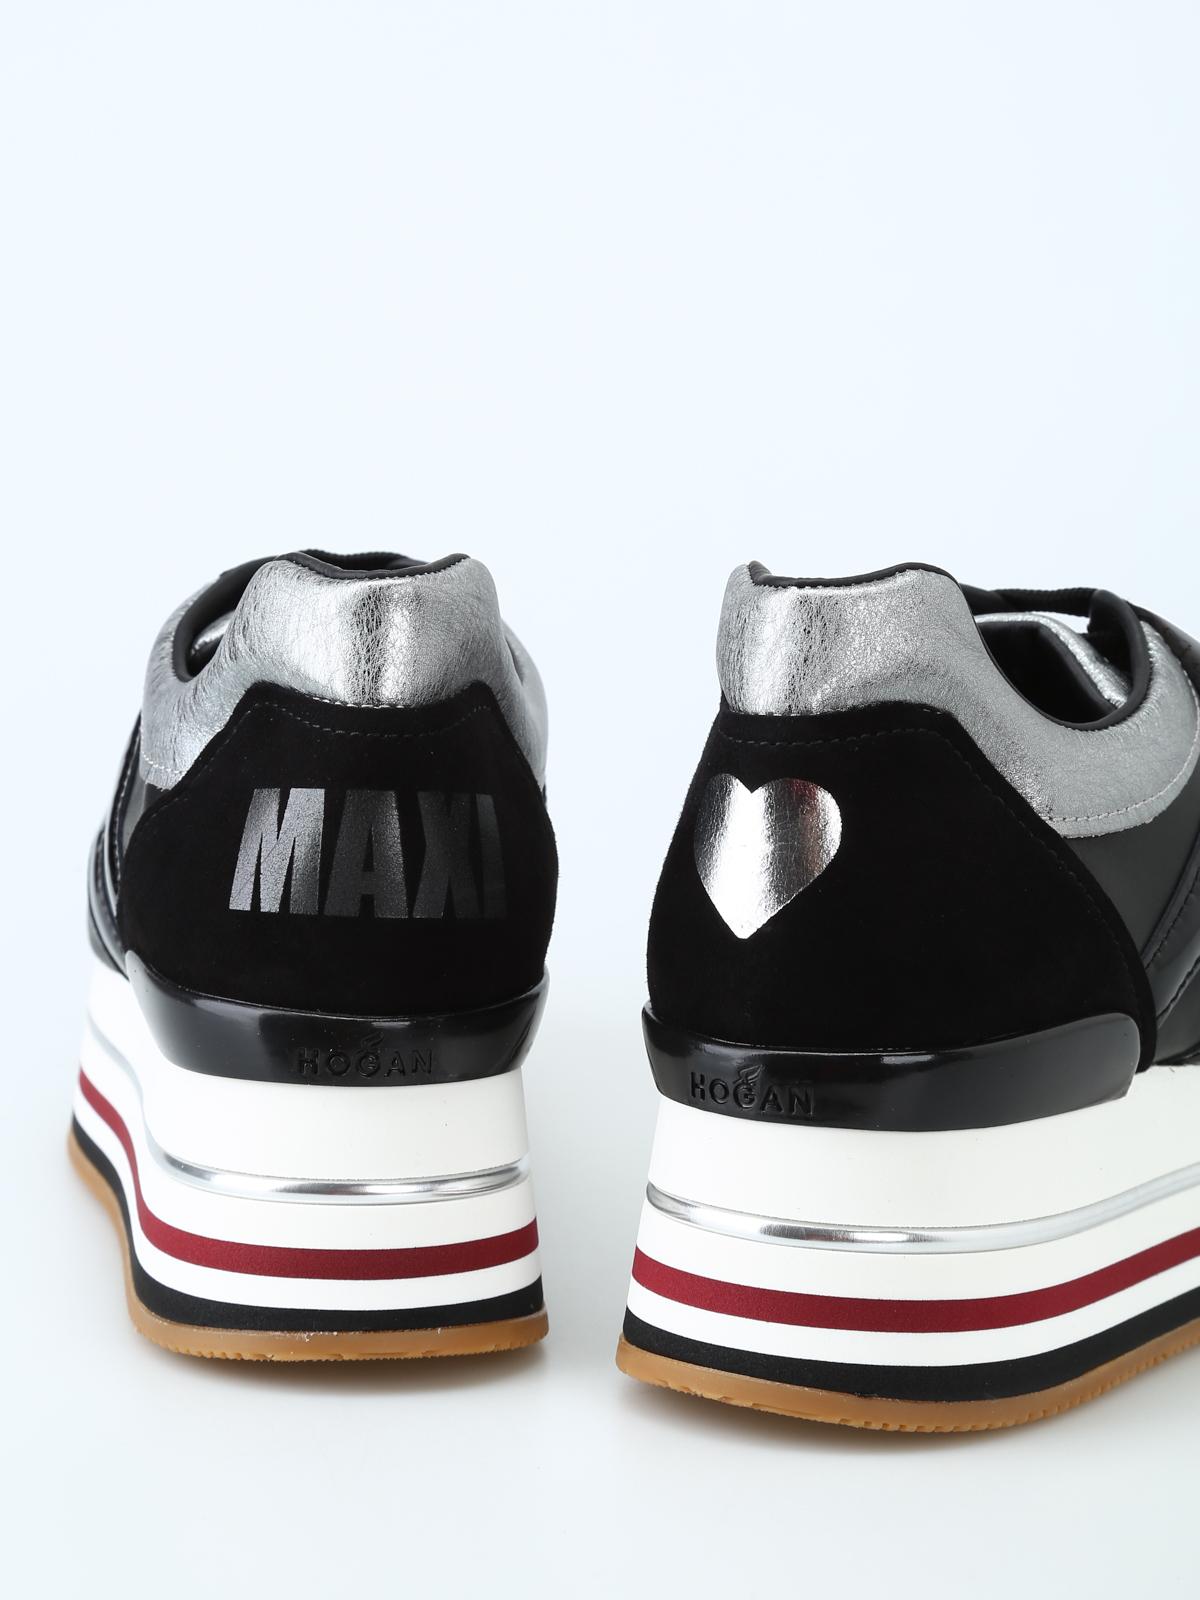 Trainers Hogan - Love black leather maxi platform sneakers ...